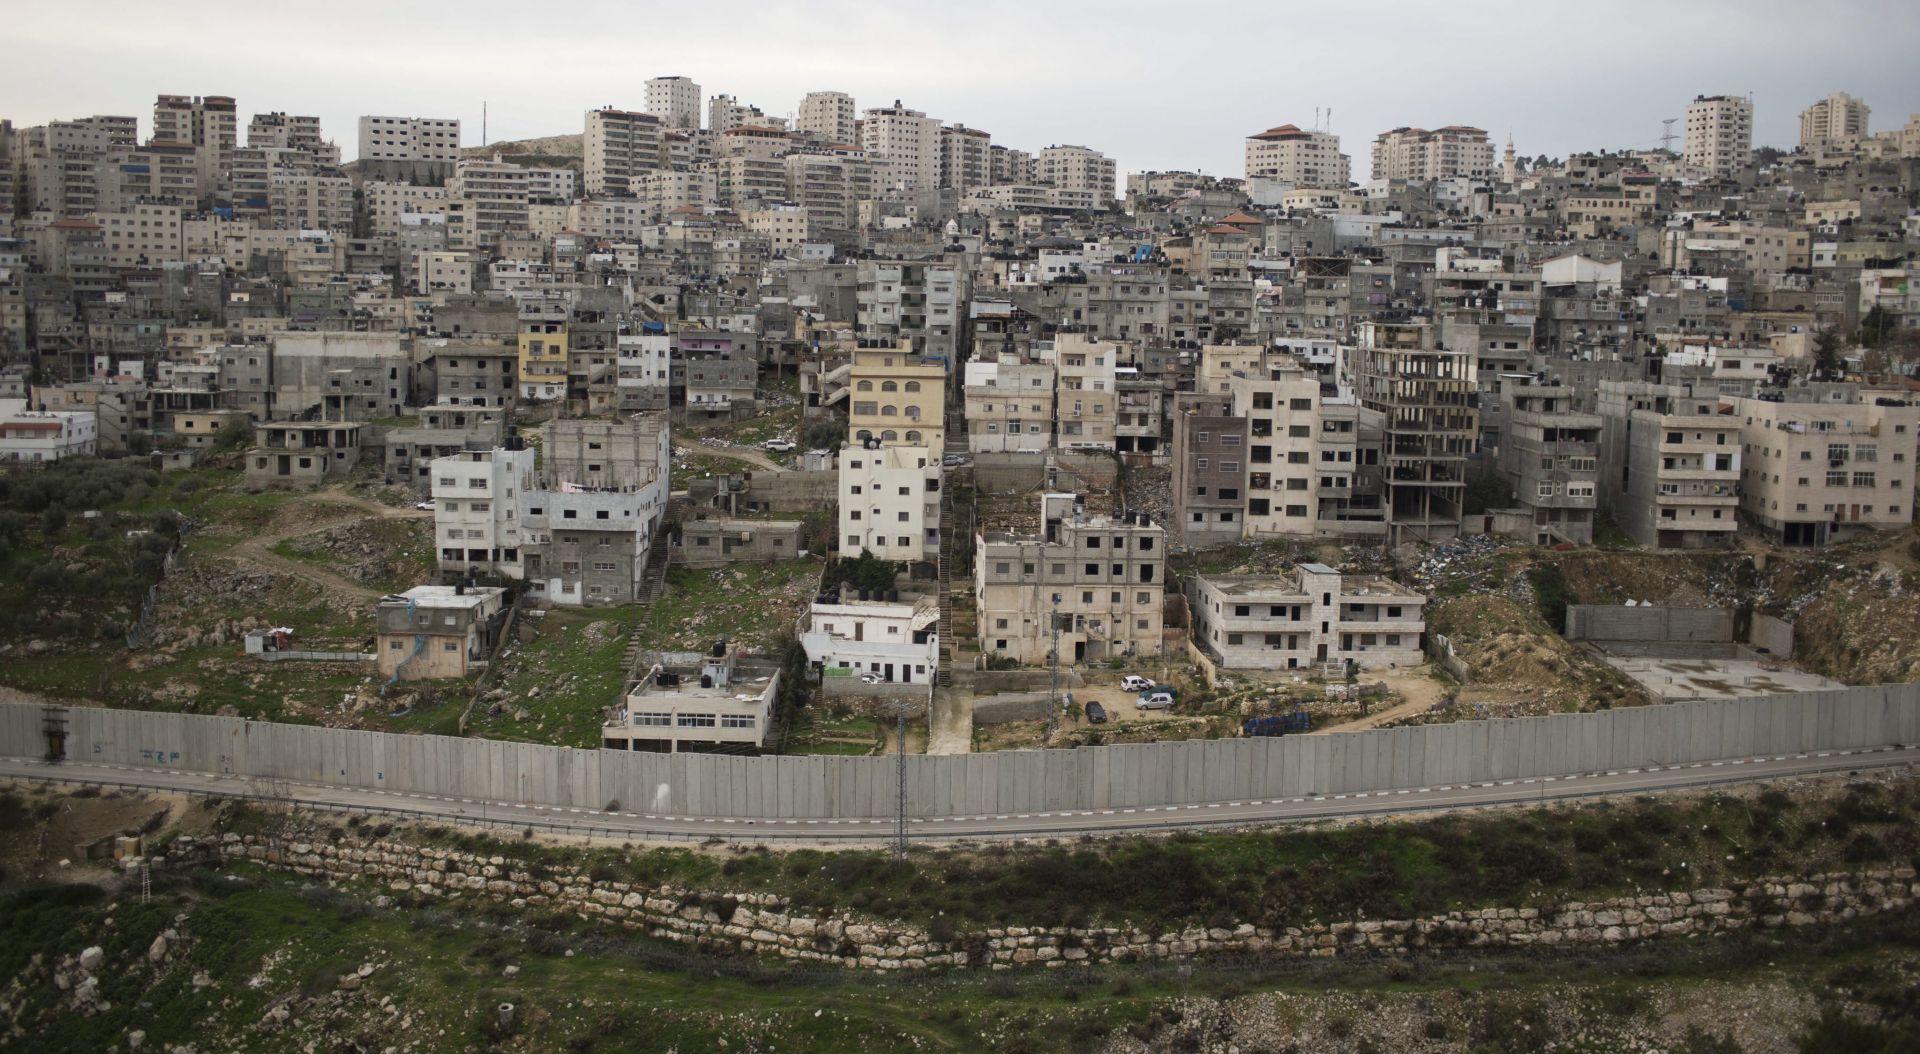 Izrael bi mogao nastaviti s izgradnjom naselja unatoč rezoluciji UN-a